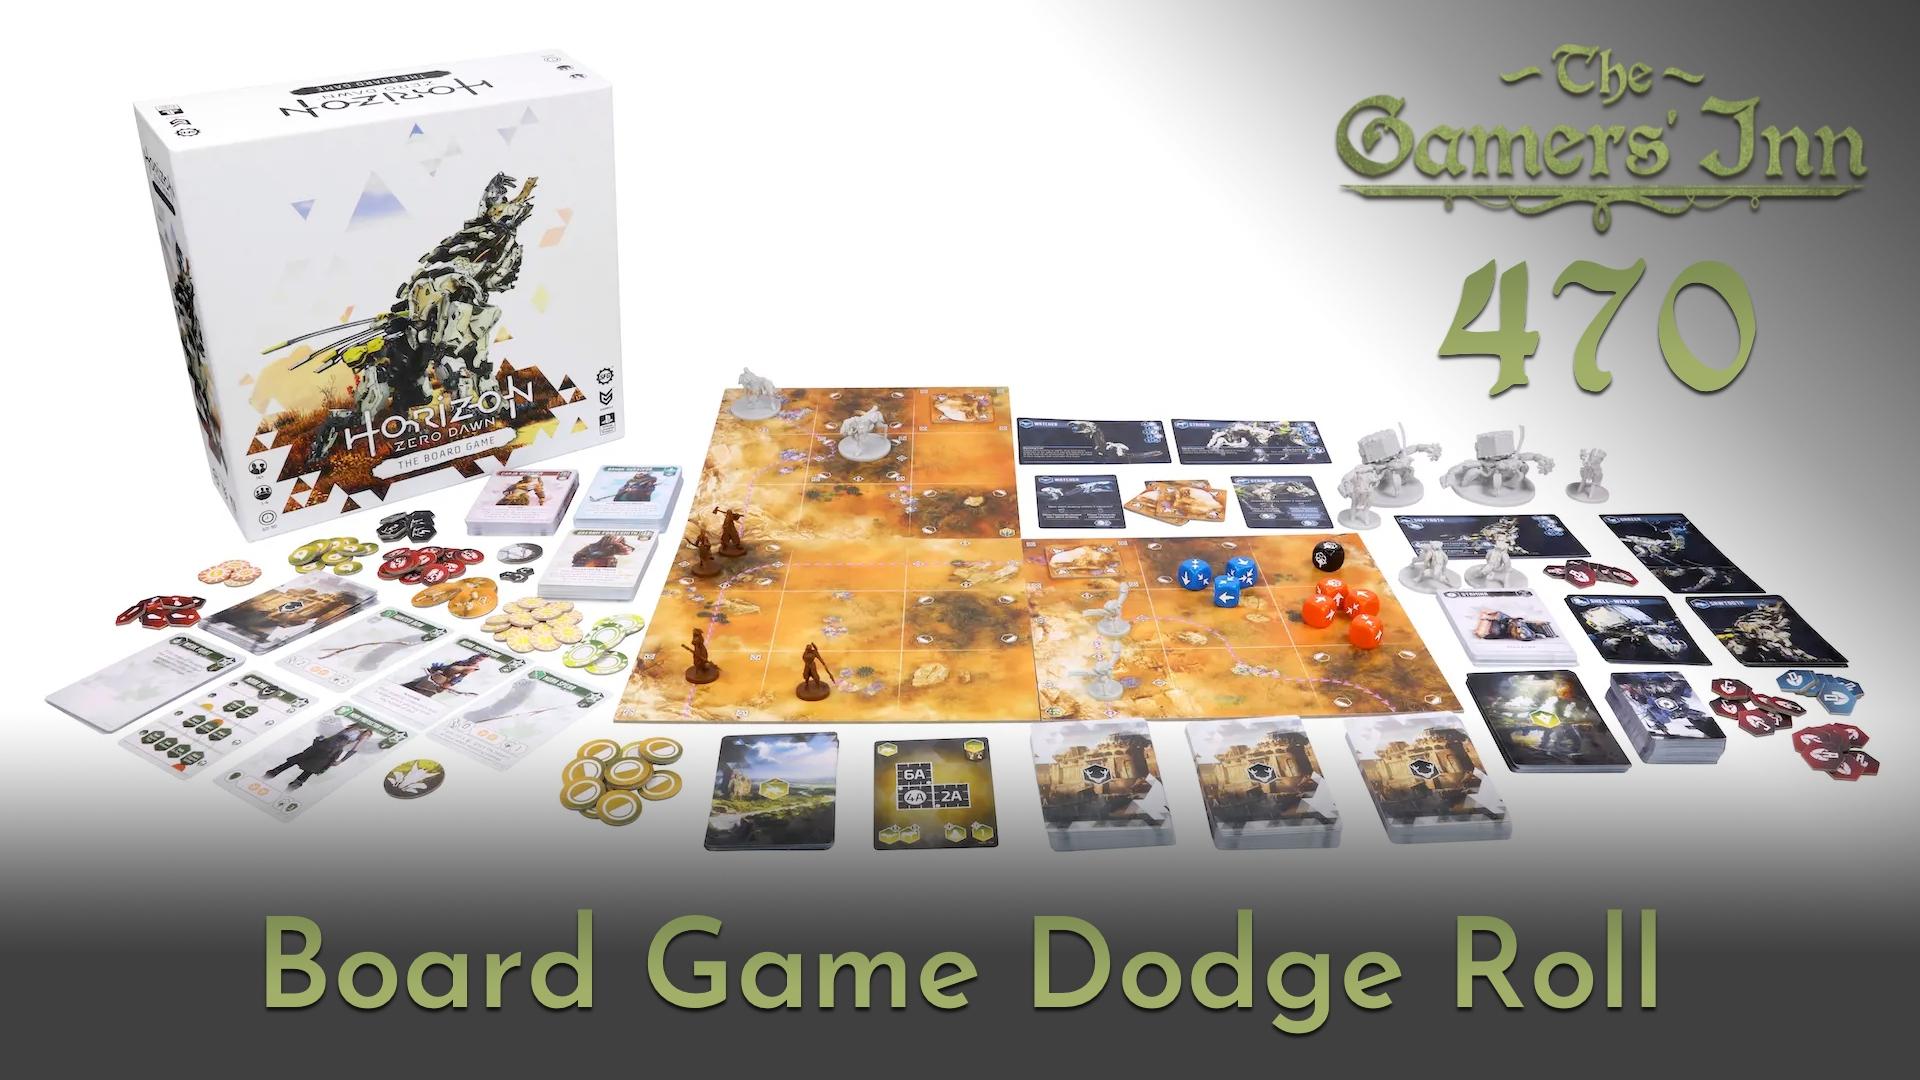 TGI 470 - Board Game Dodge Roll